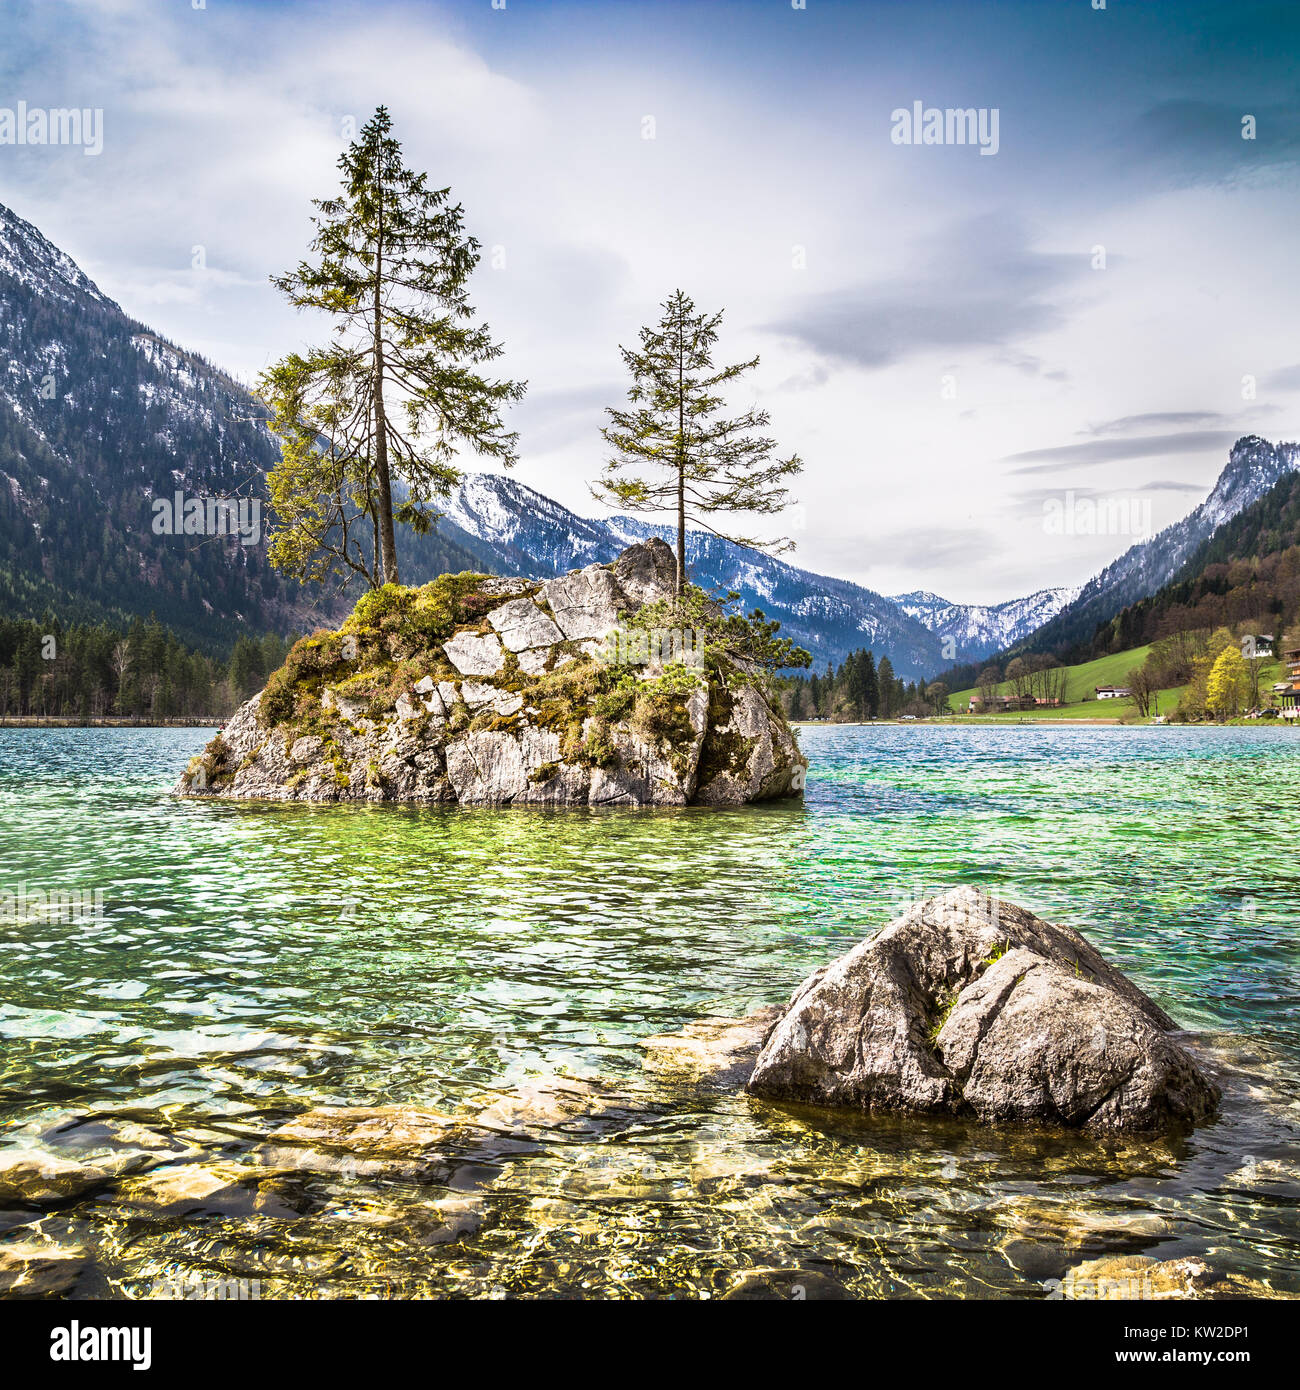 Idyllic landscape with trees on a rock at lake Hintersee, Nationalpark Berchtesgadener Land, Bavaria, Germany - Stock Image